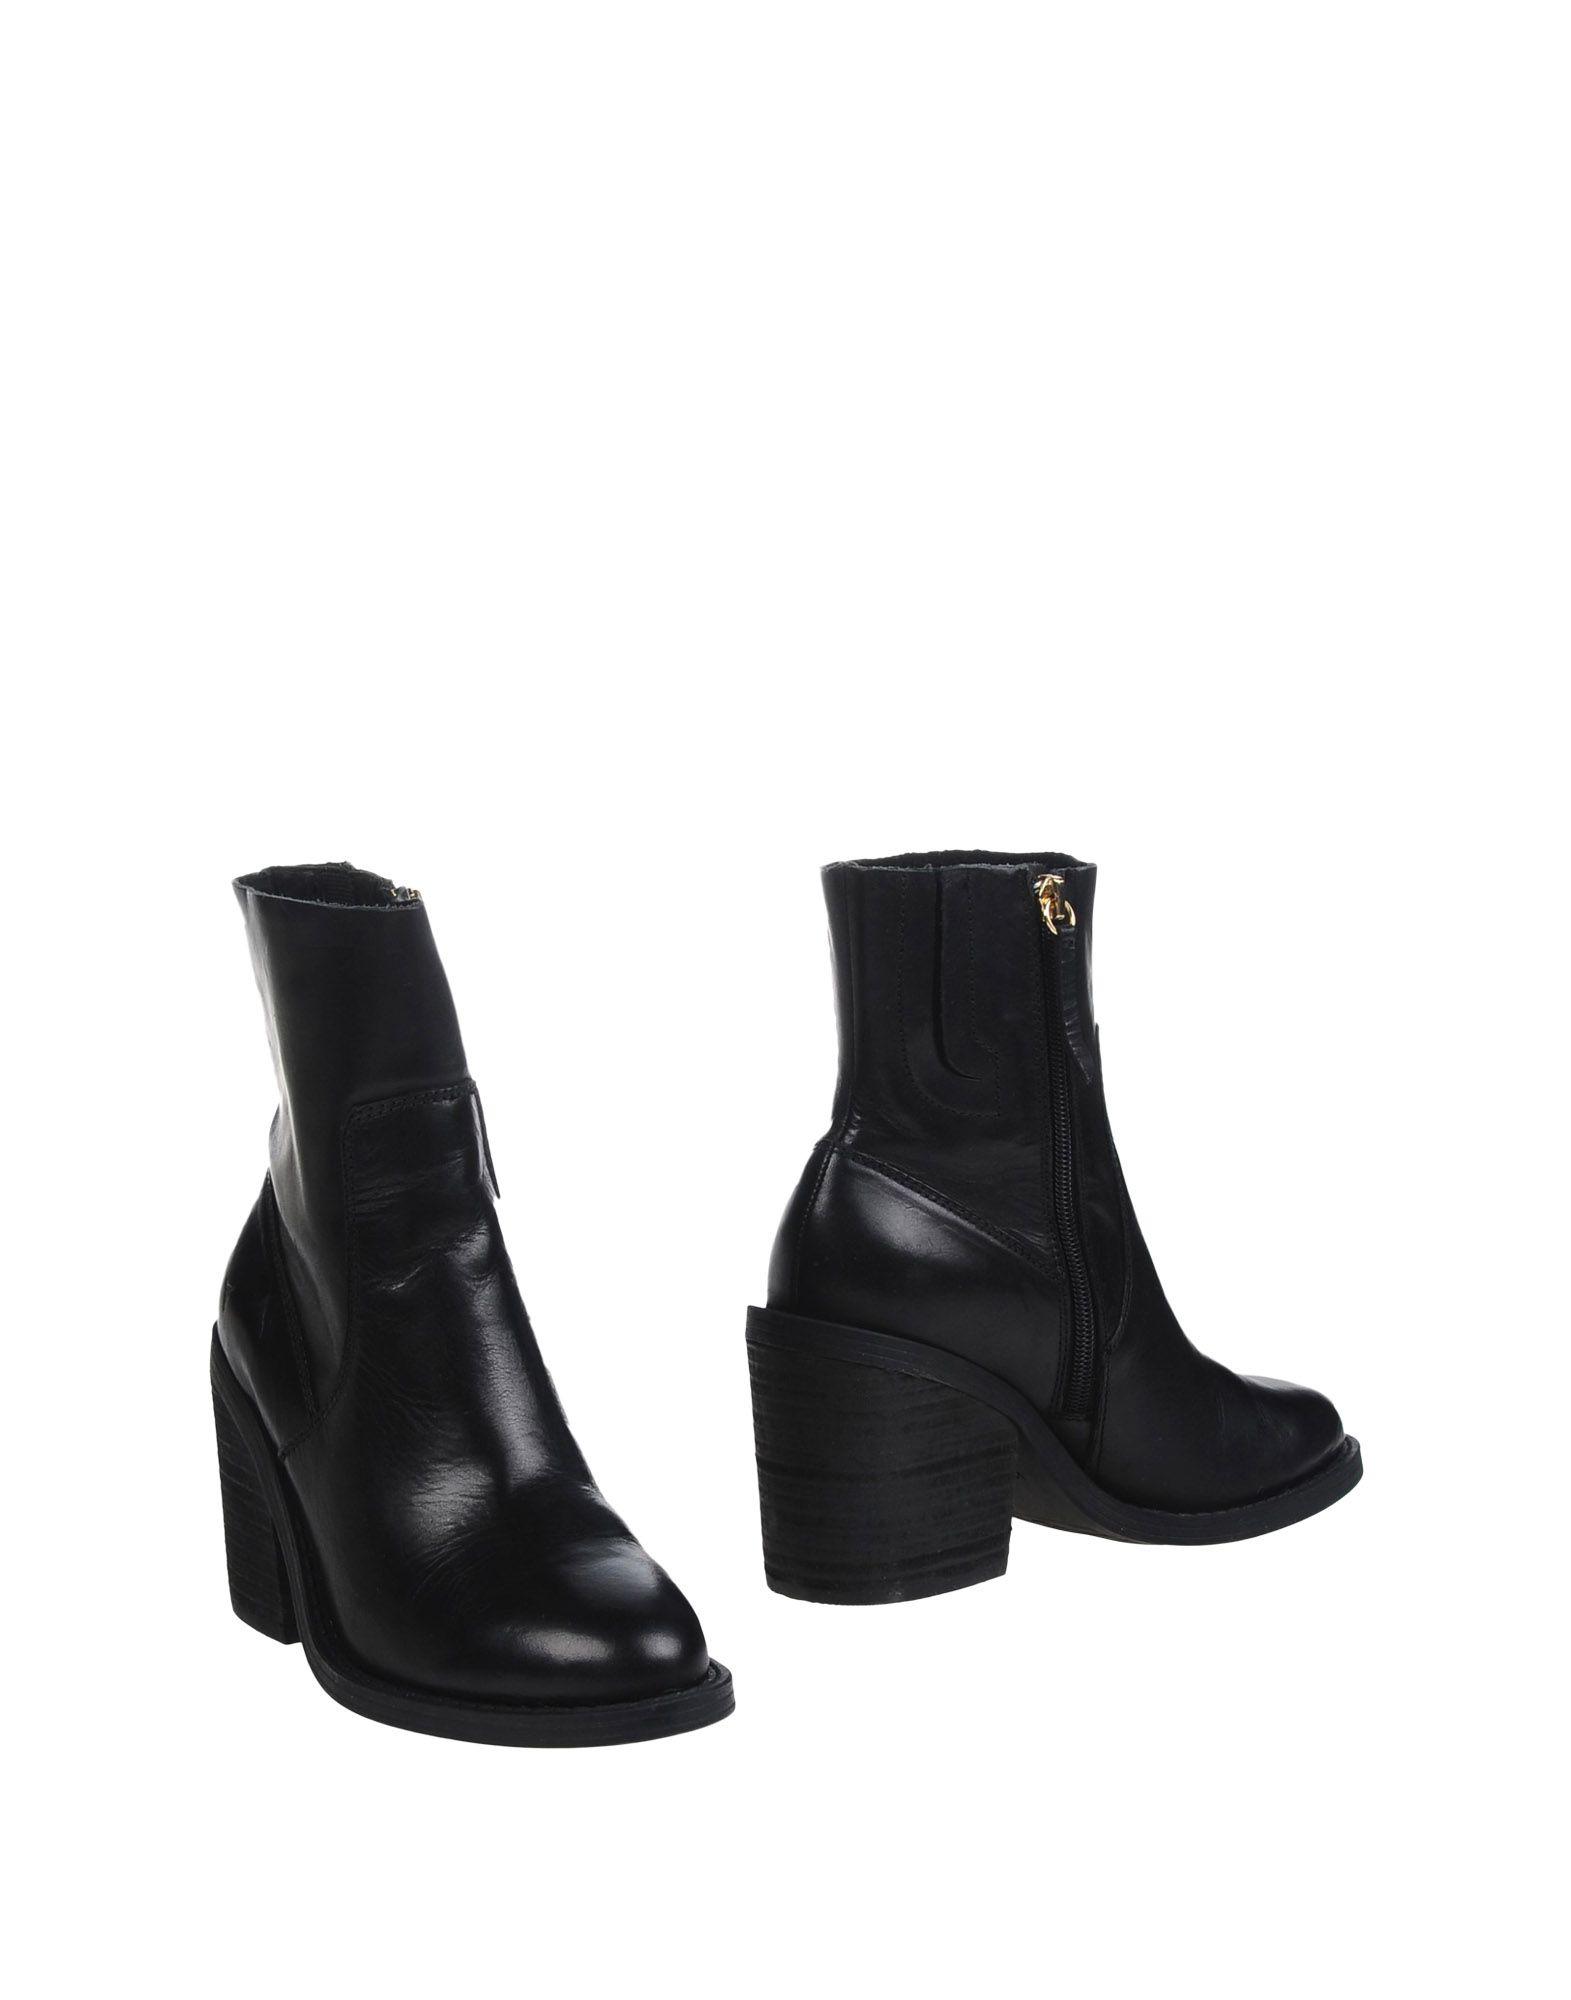 WINDSOR SMITH Полусапоги и высокие ботинки windsor smith ботинки